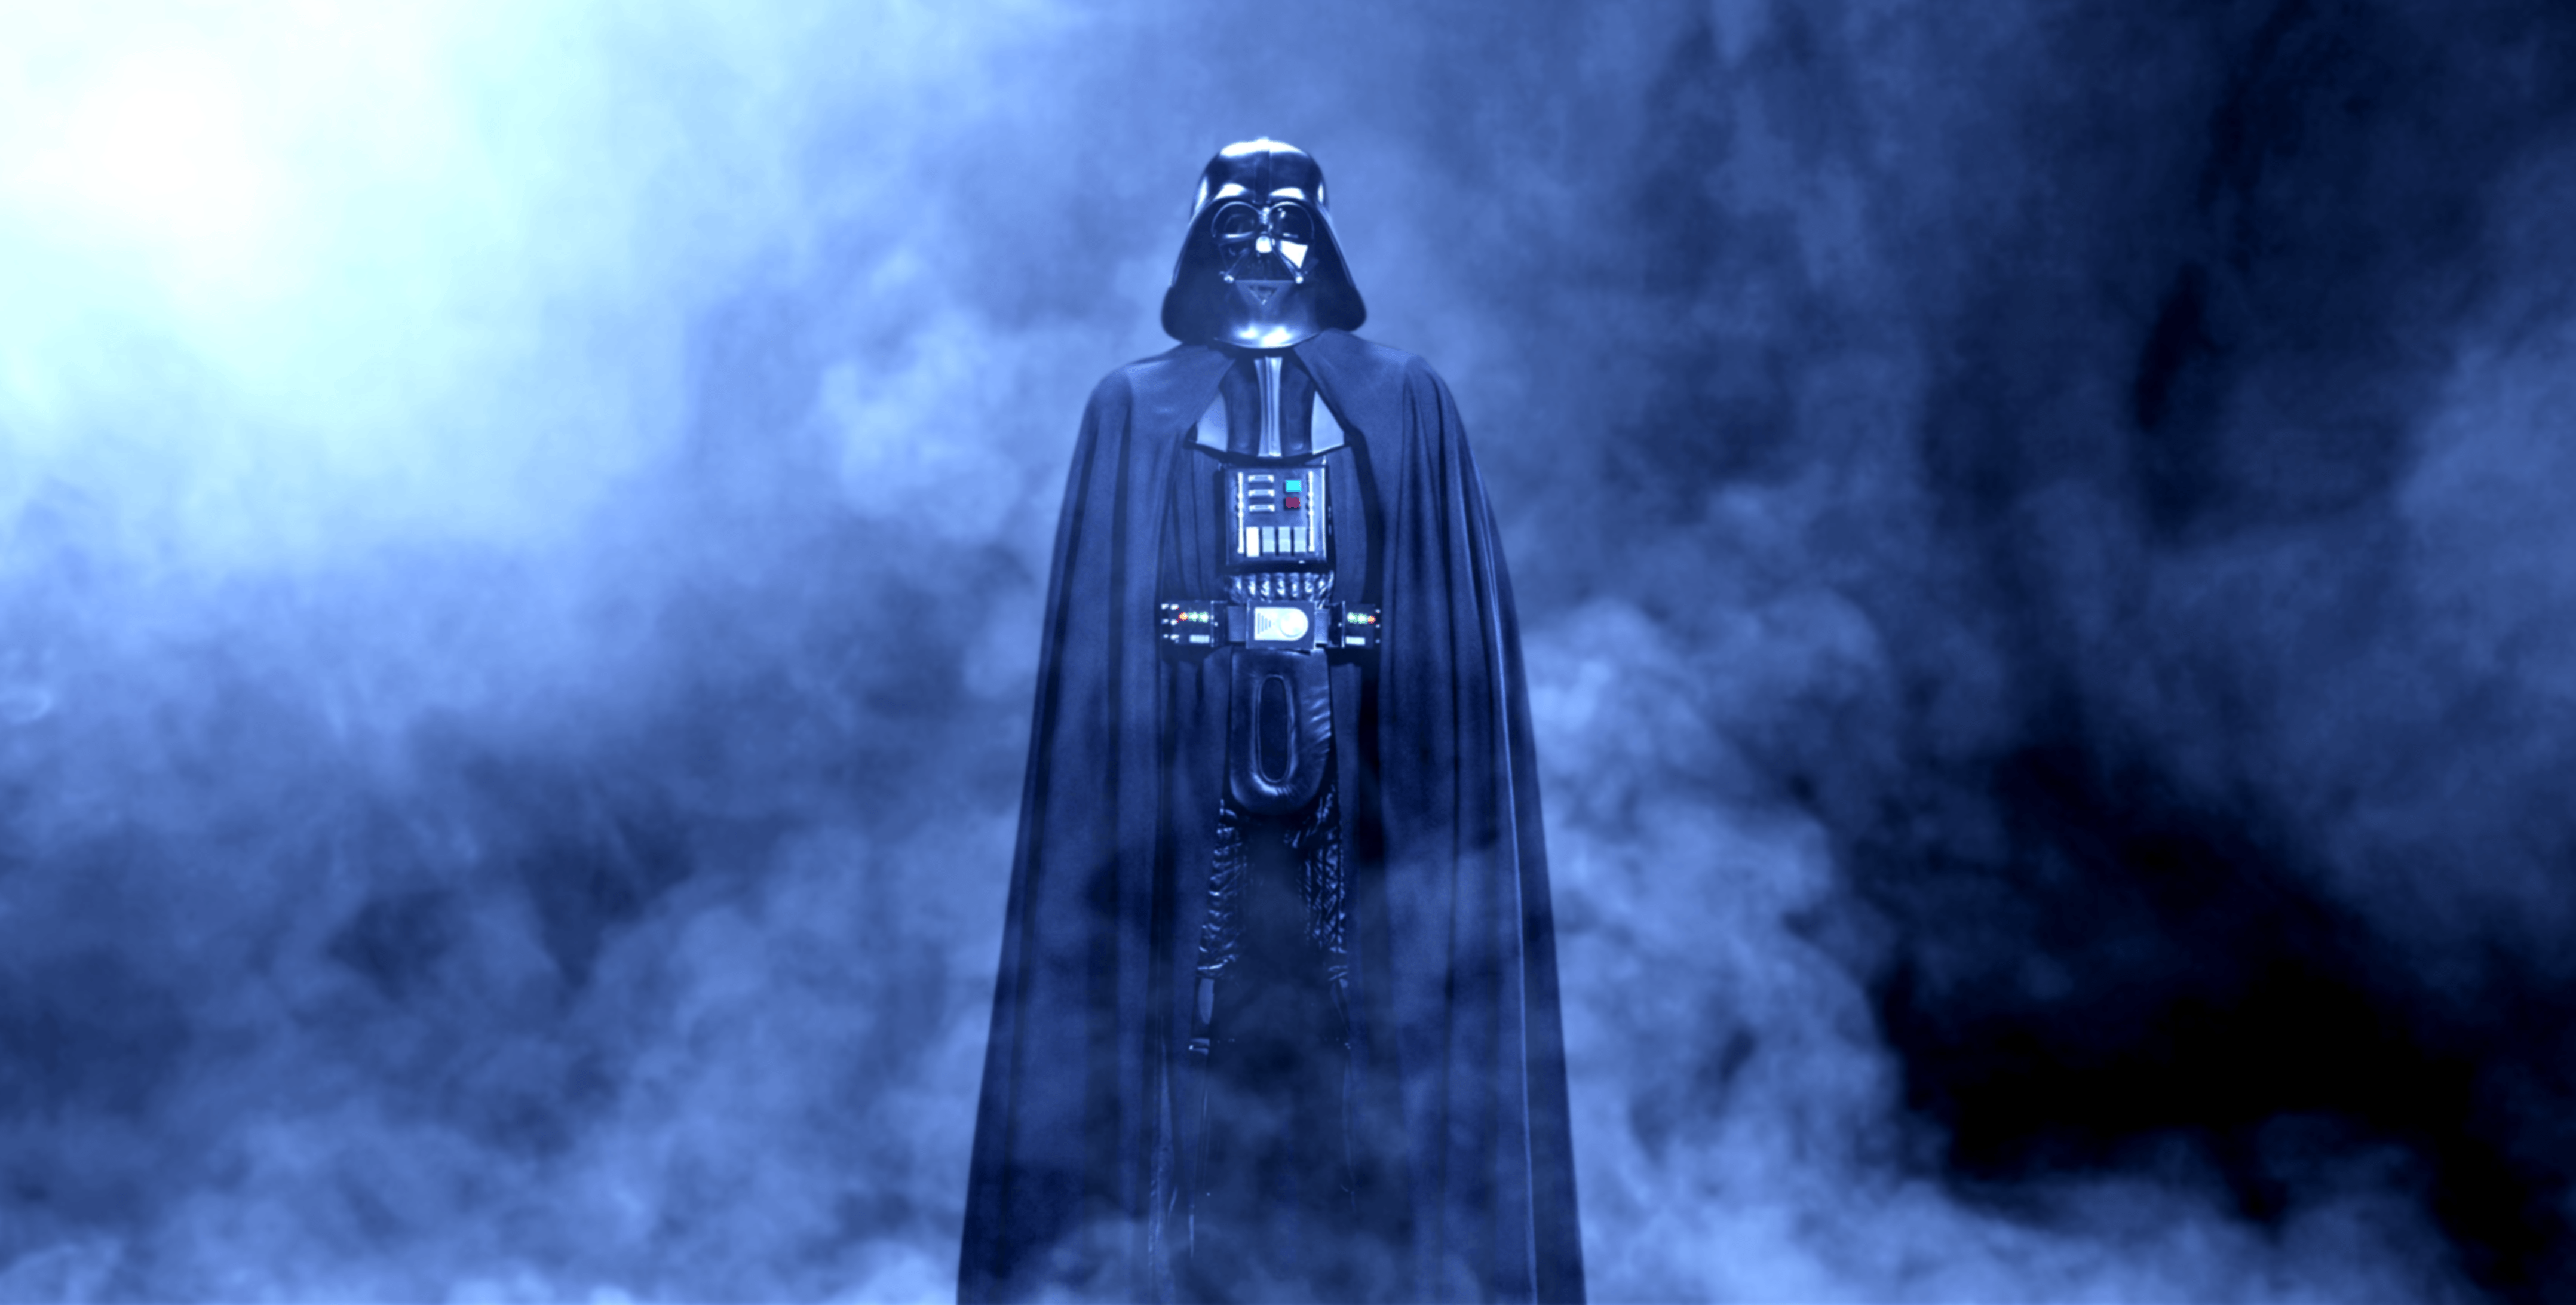 Darth Vader 1080p Wallpapers - Wallpaper Cave